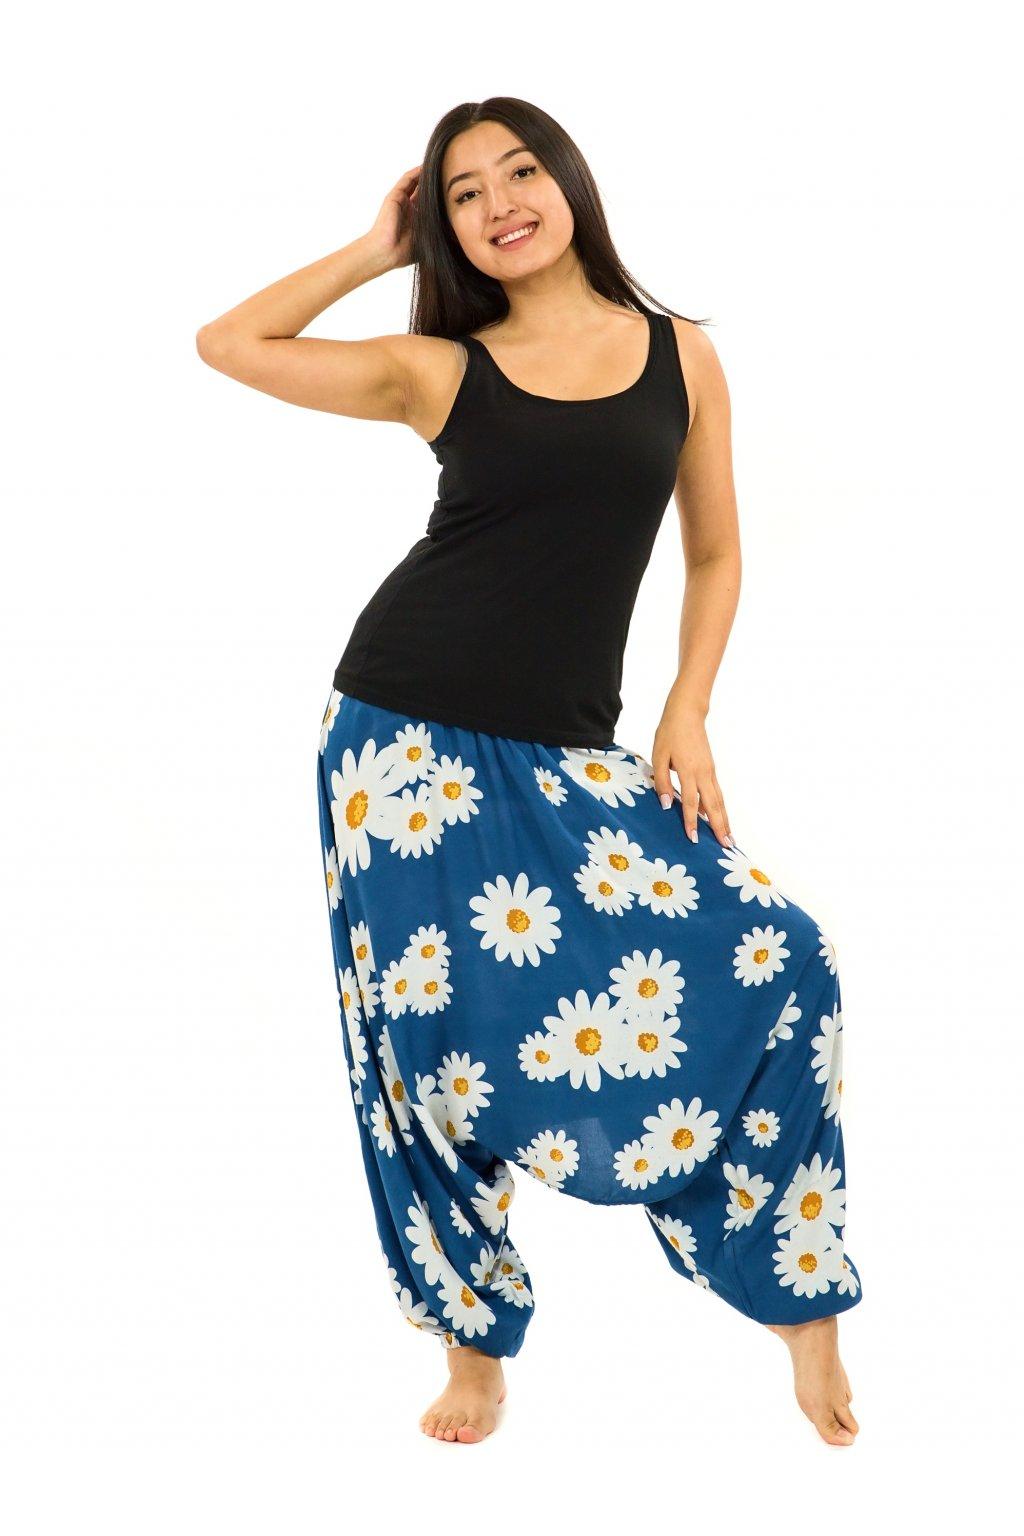 Kalhoty-šaty-top 3v1 Kopretina - modrá